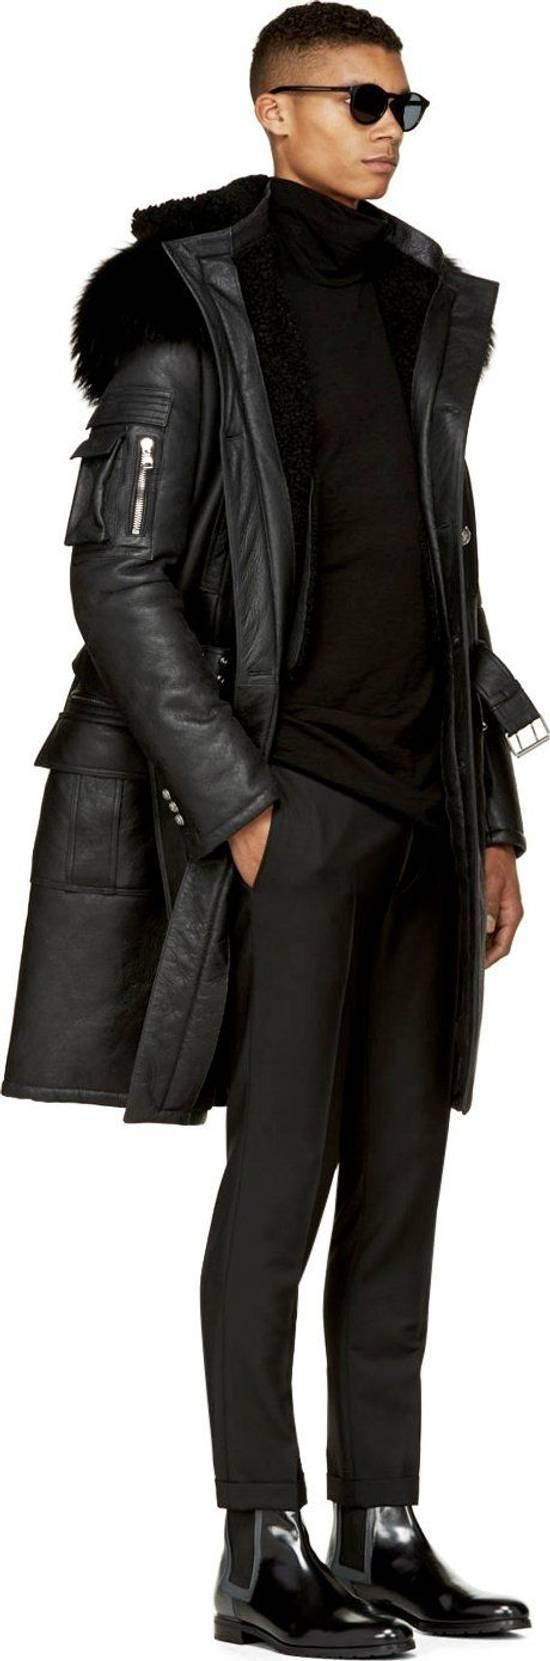 Balmain Balmain Leather Shearling Fur Parka Black Size Small 46-48 Coat Military Size US S / EU 44-46 / 1